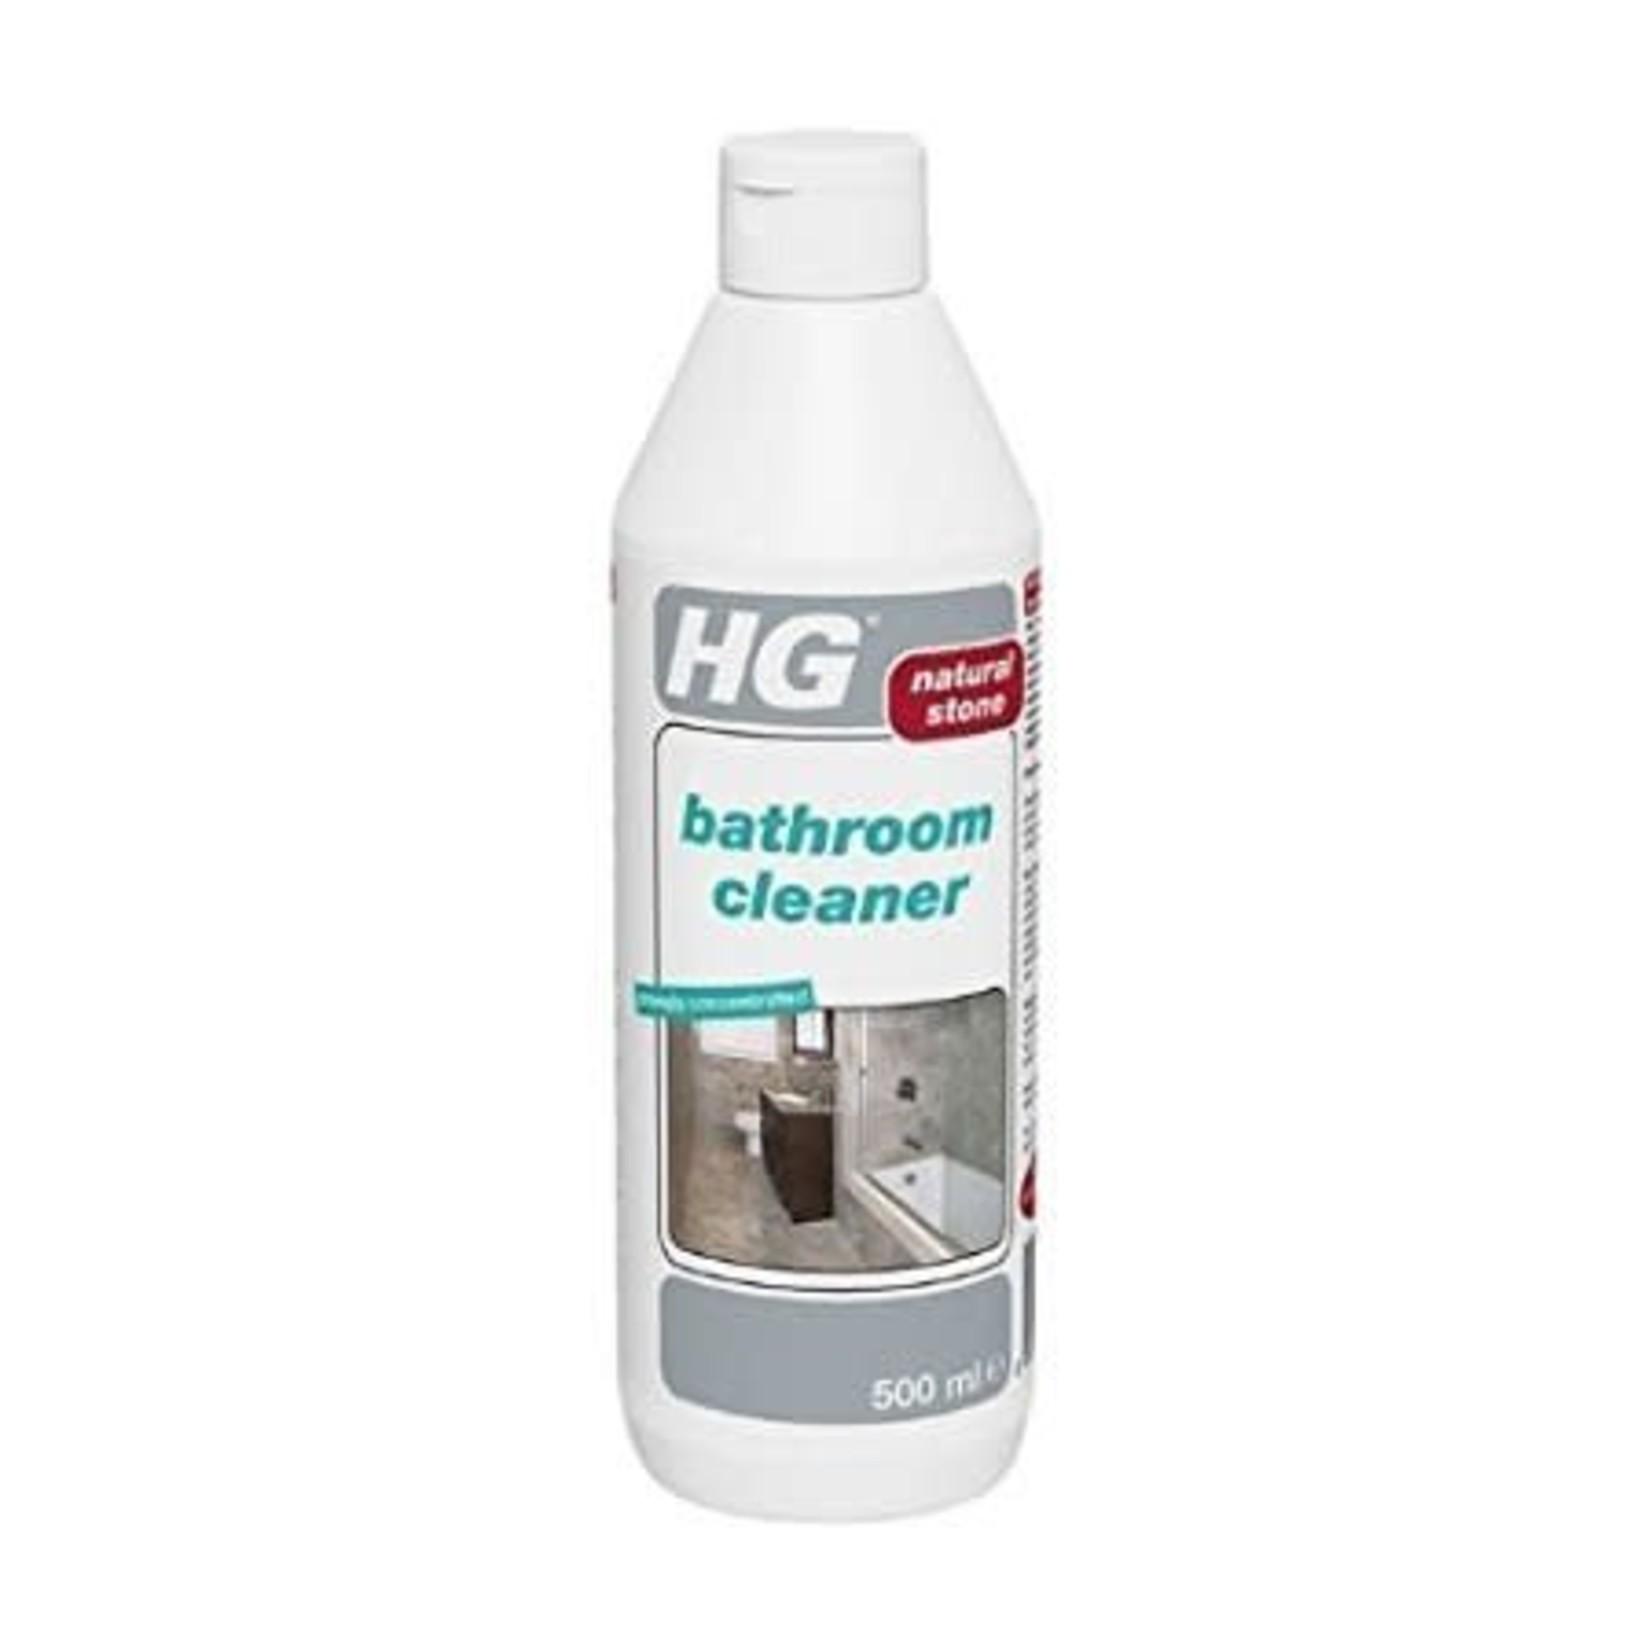 HG HG BATHROOM CLEANER NATURAL STONE